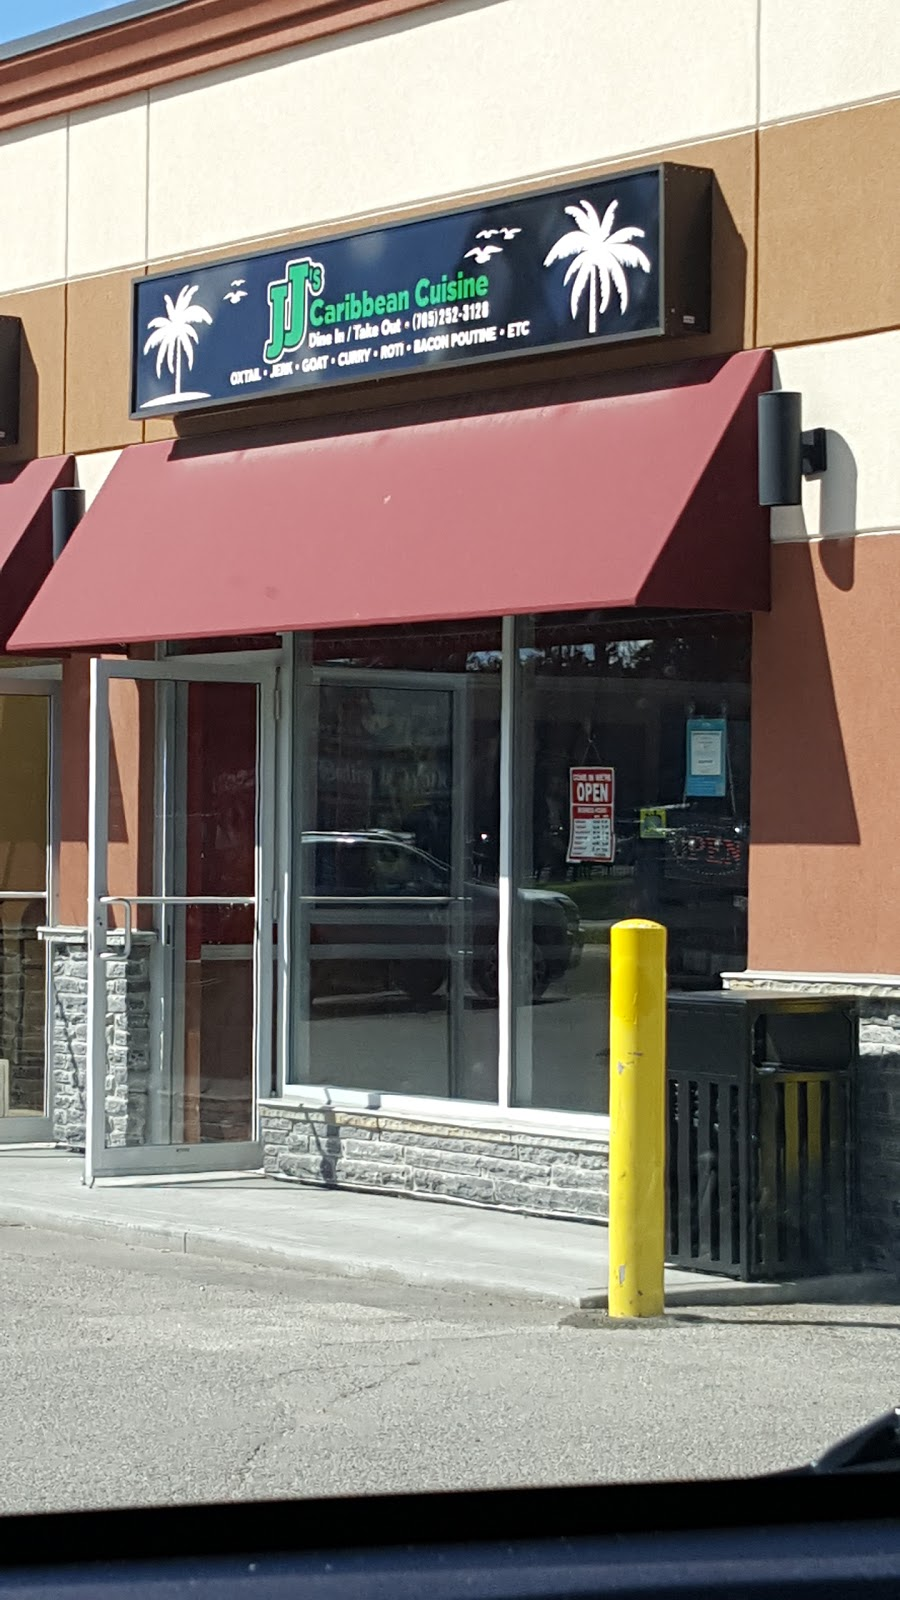 Jjs Caribbean Cuisine | restaurant | 110 Little Ave, Barrie, ON L4N 4K8, Canada | 7052523128 OR +1 705-252-3128